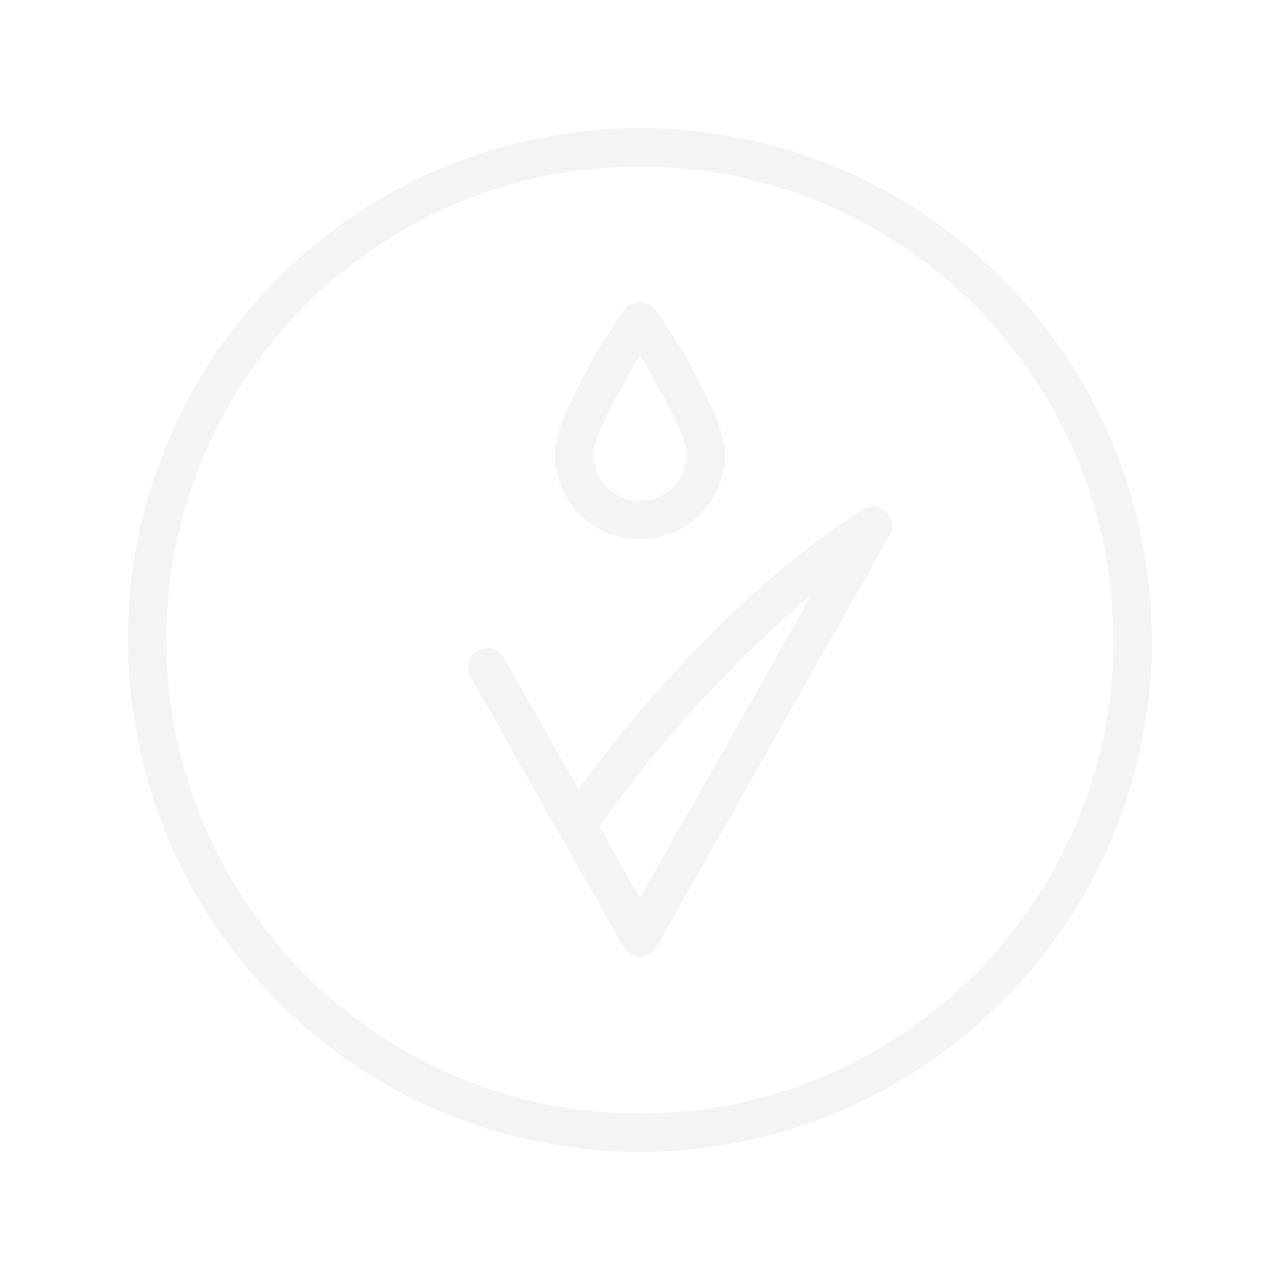 Estee Lauder Double Wear Zero-Smudge Lengthening Mascara 01 Black 6ml